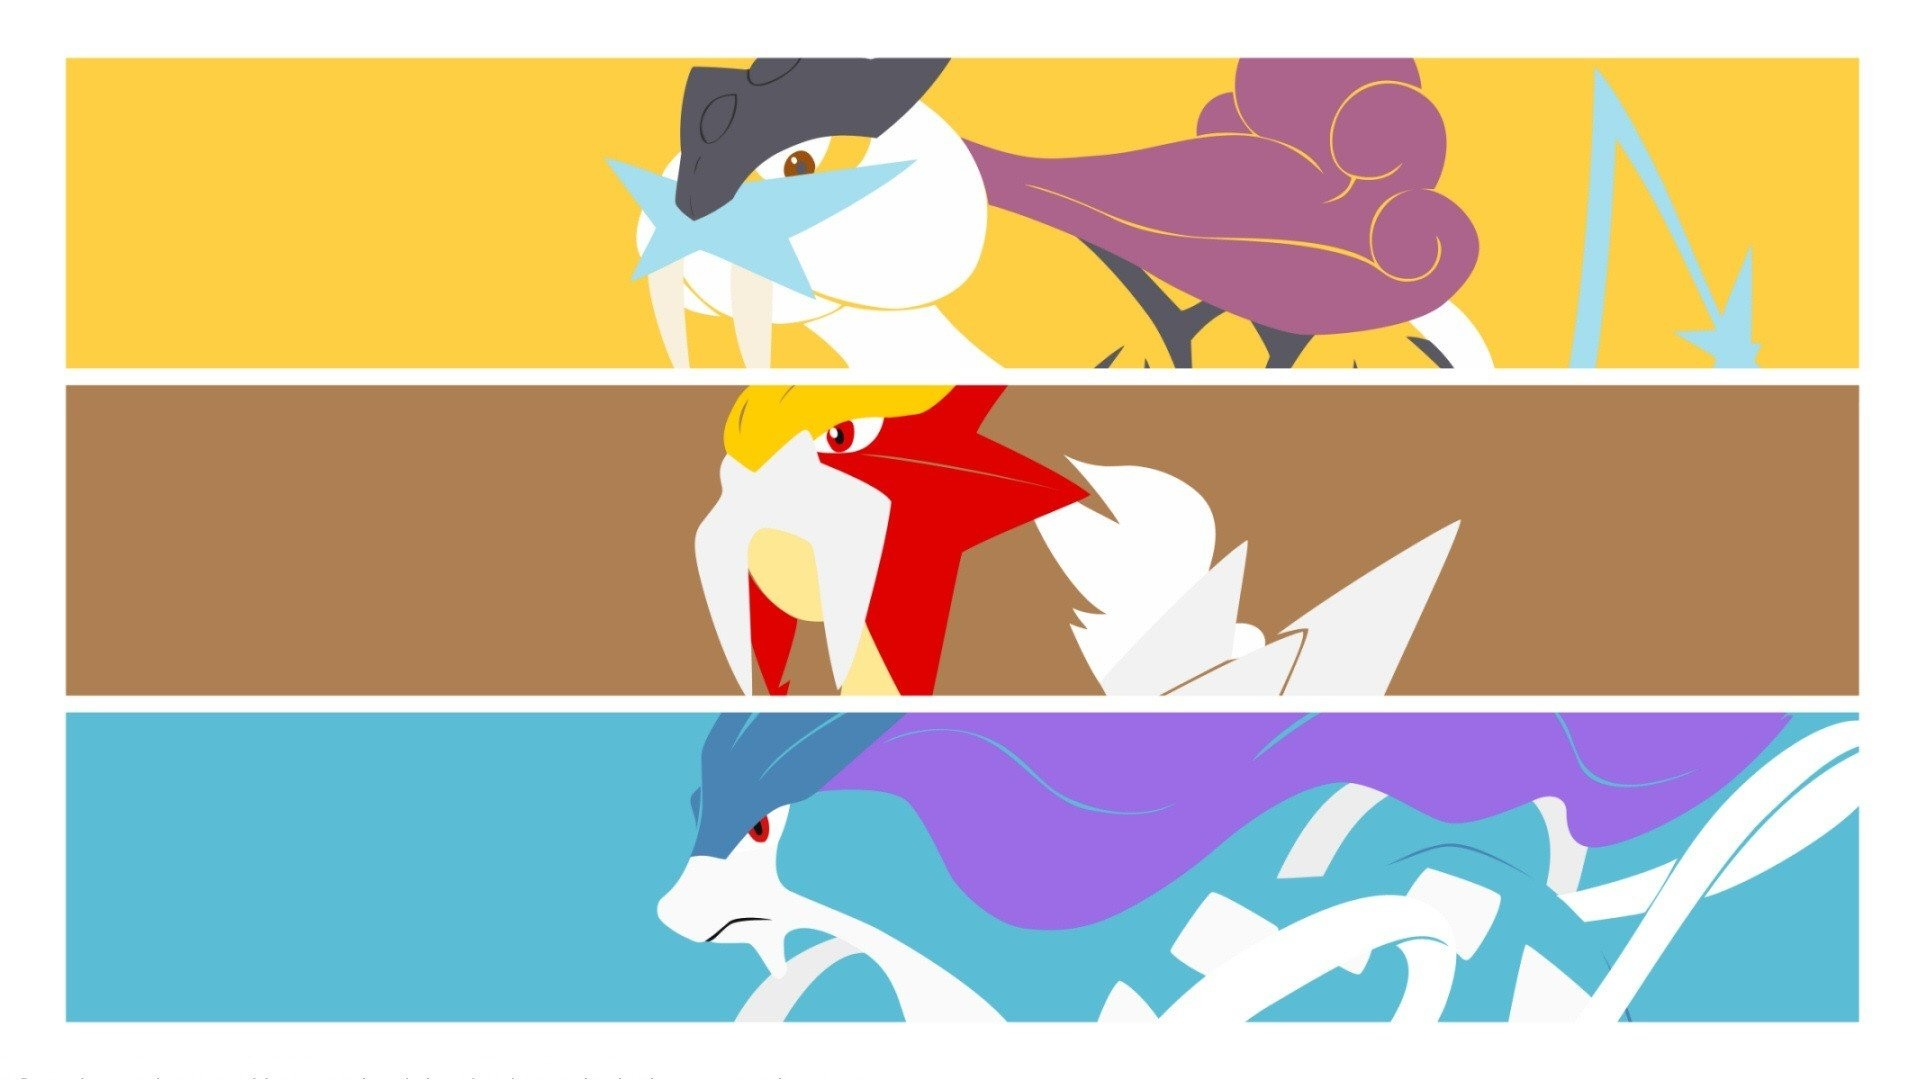 Res: 1920x1080, Raikou, Entei, Suicune, Pokémon HD Wallpapers / Desktop and Mobile Images &  Photos